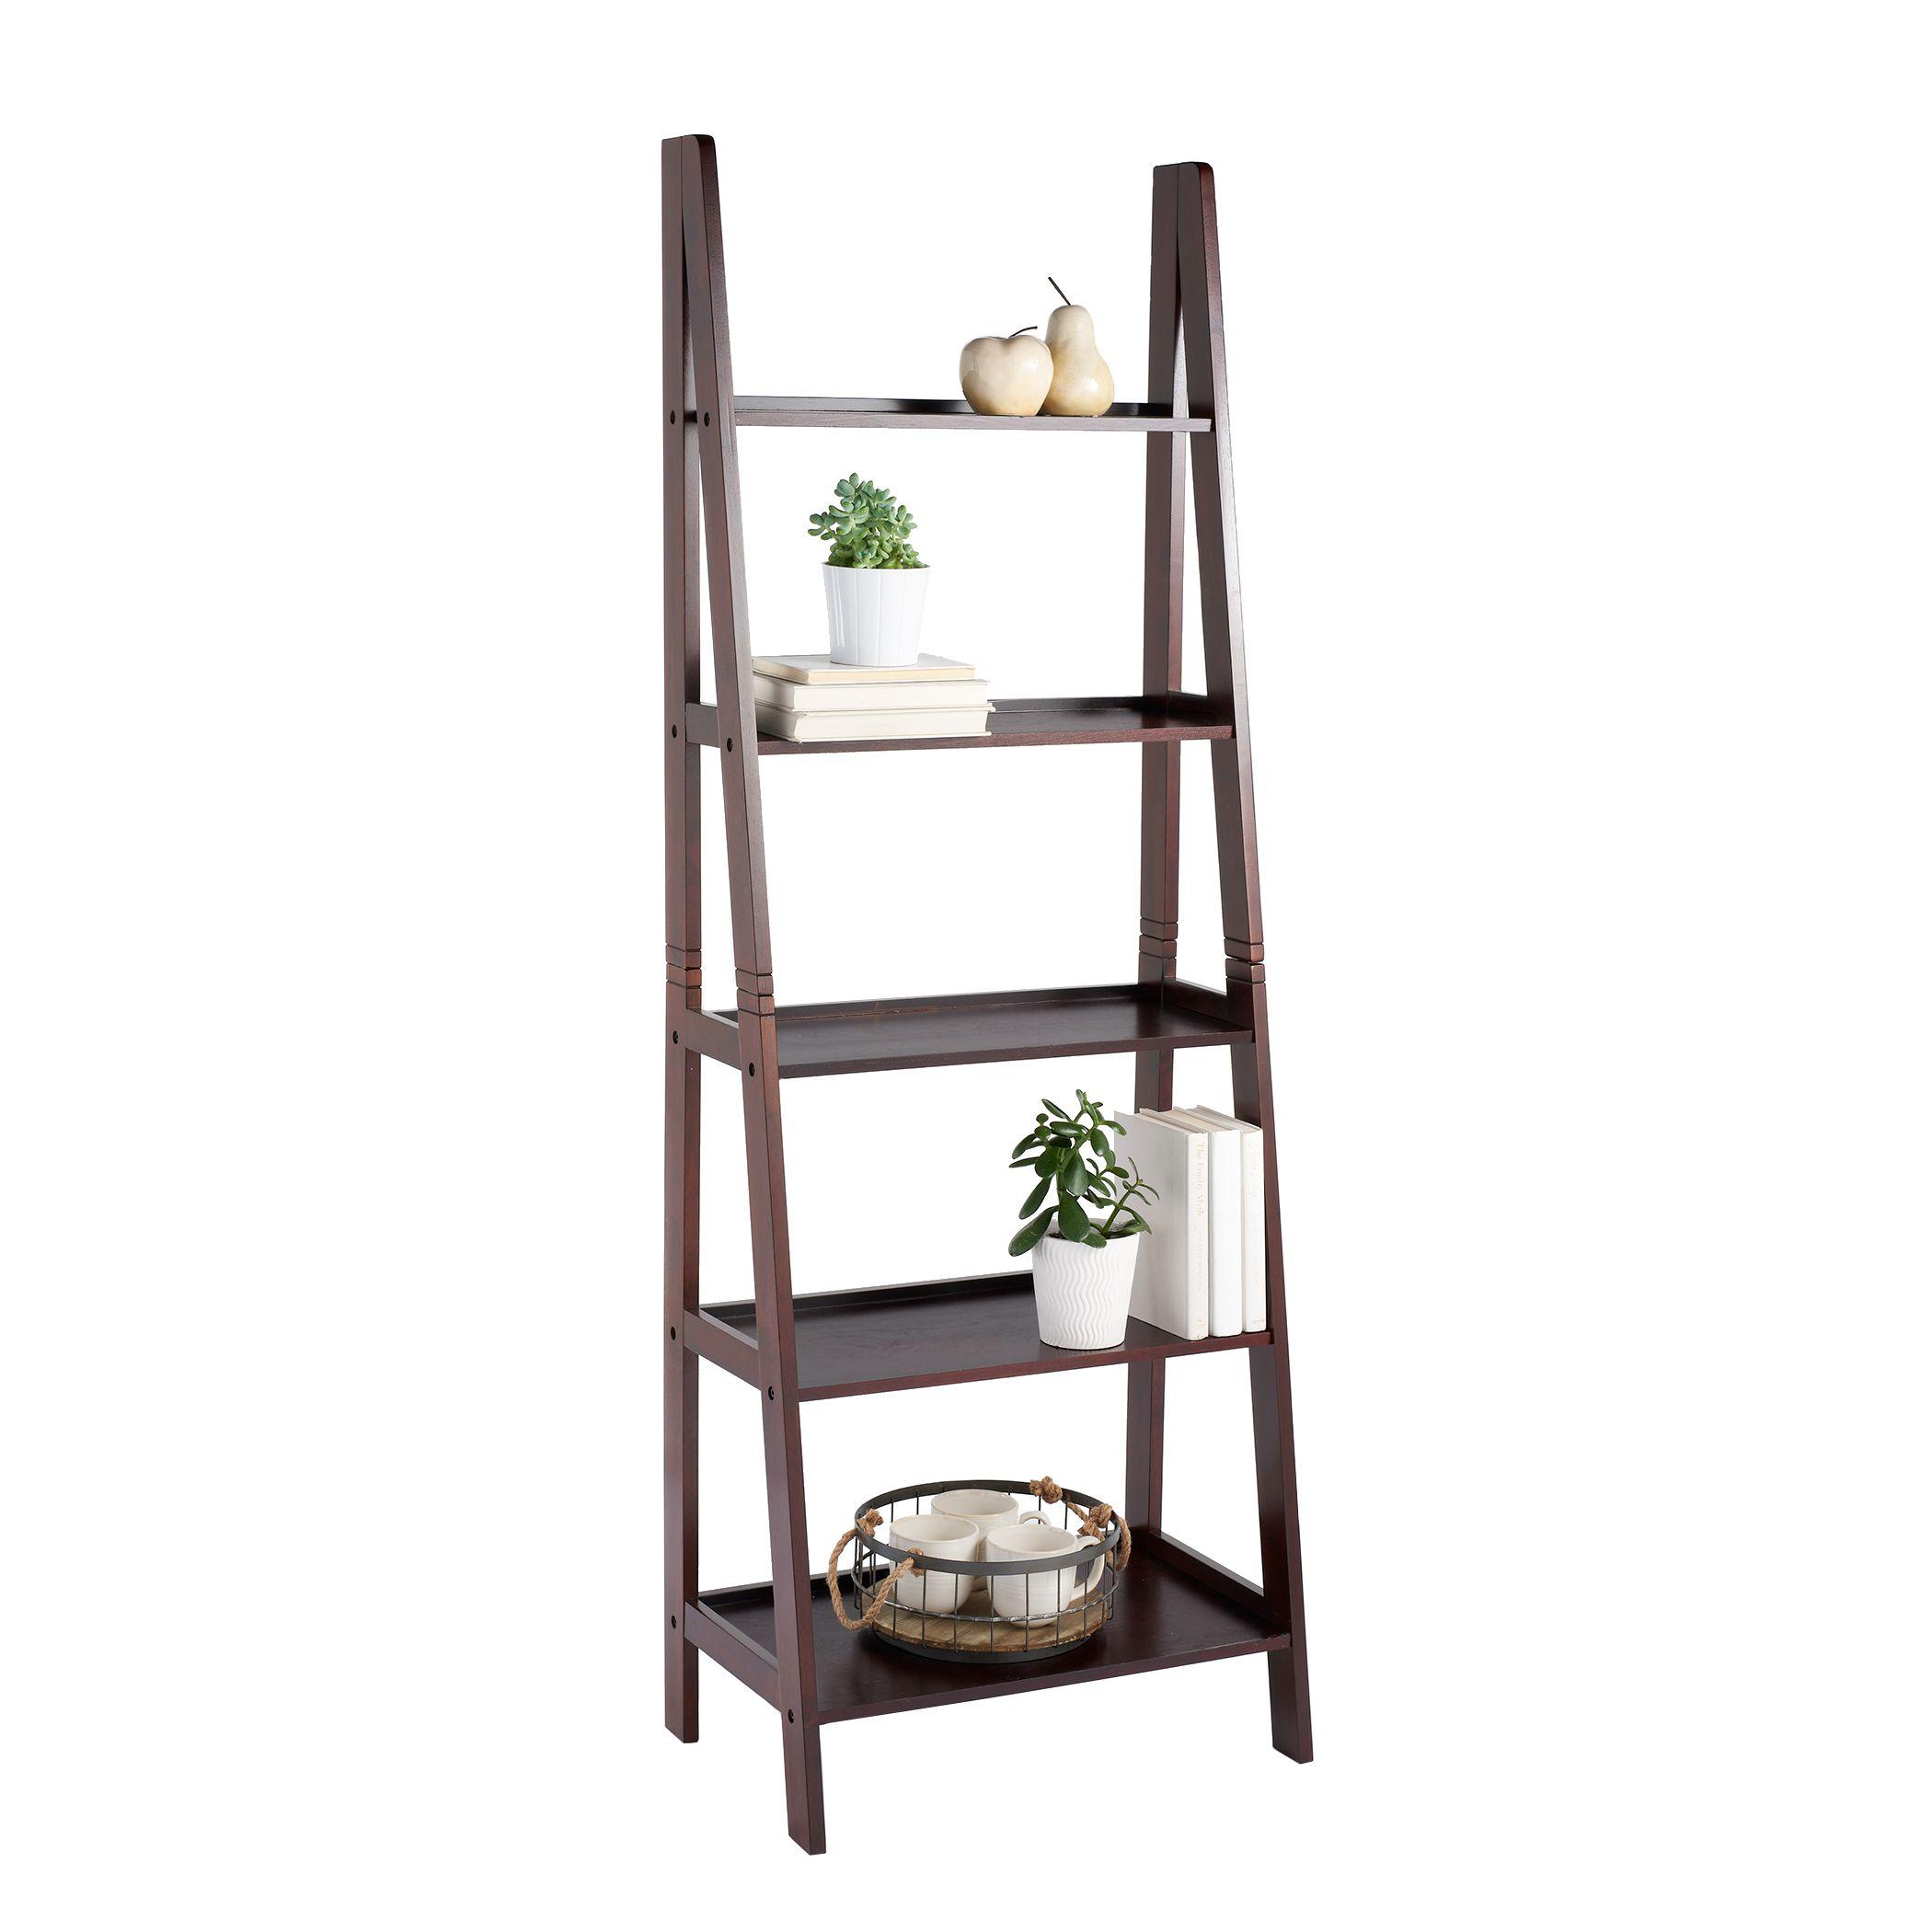 Tier Bookshelf